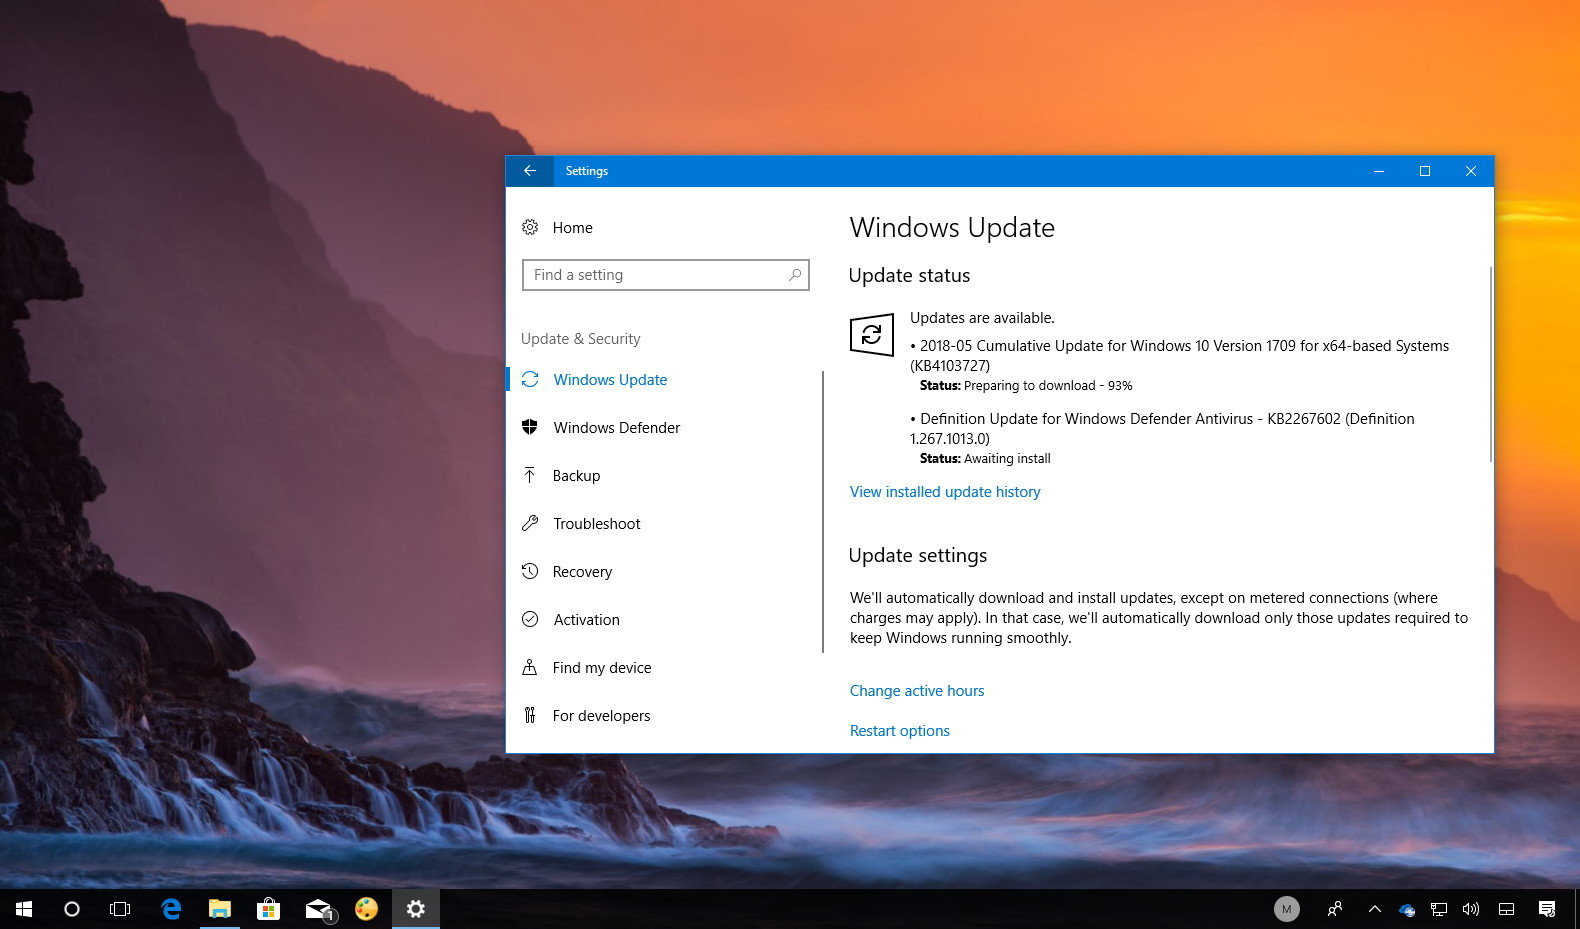 KB4103727 update for Windows 10